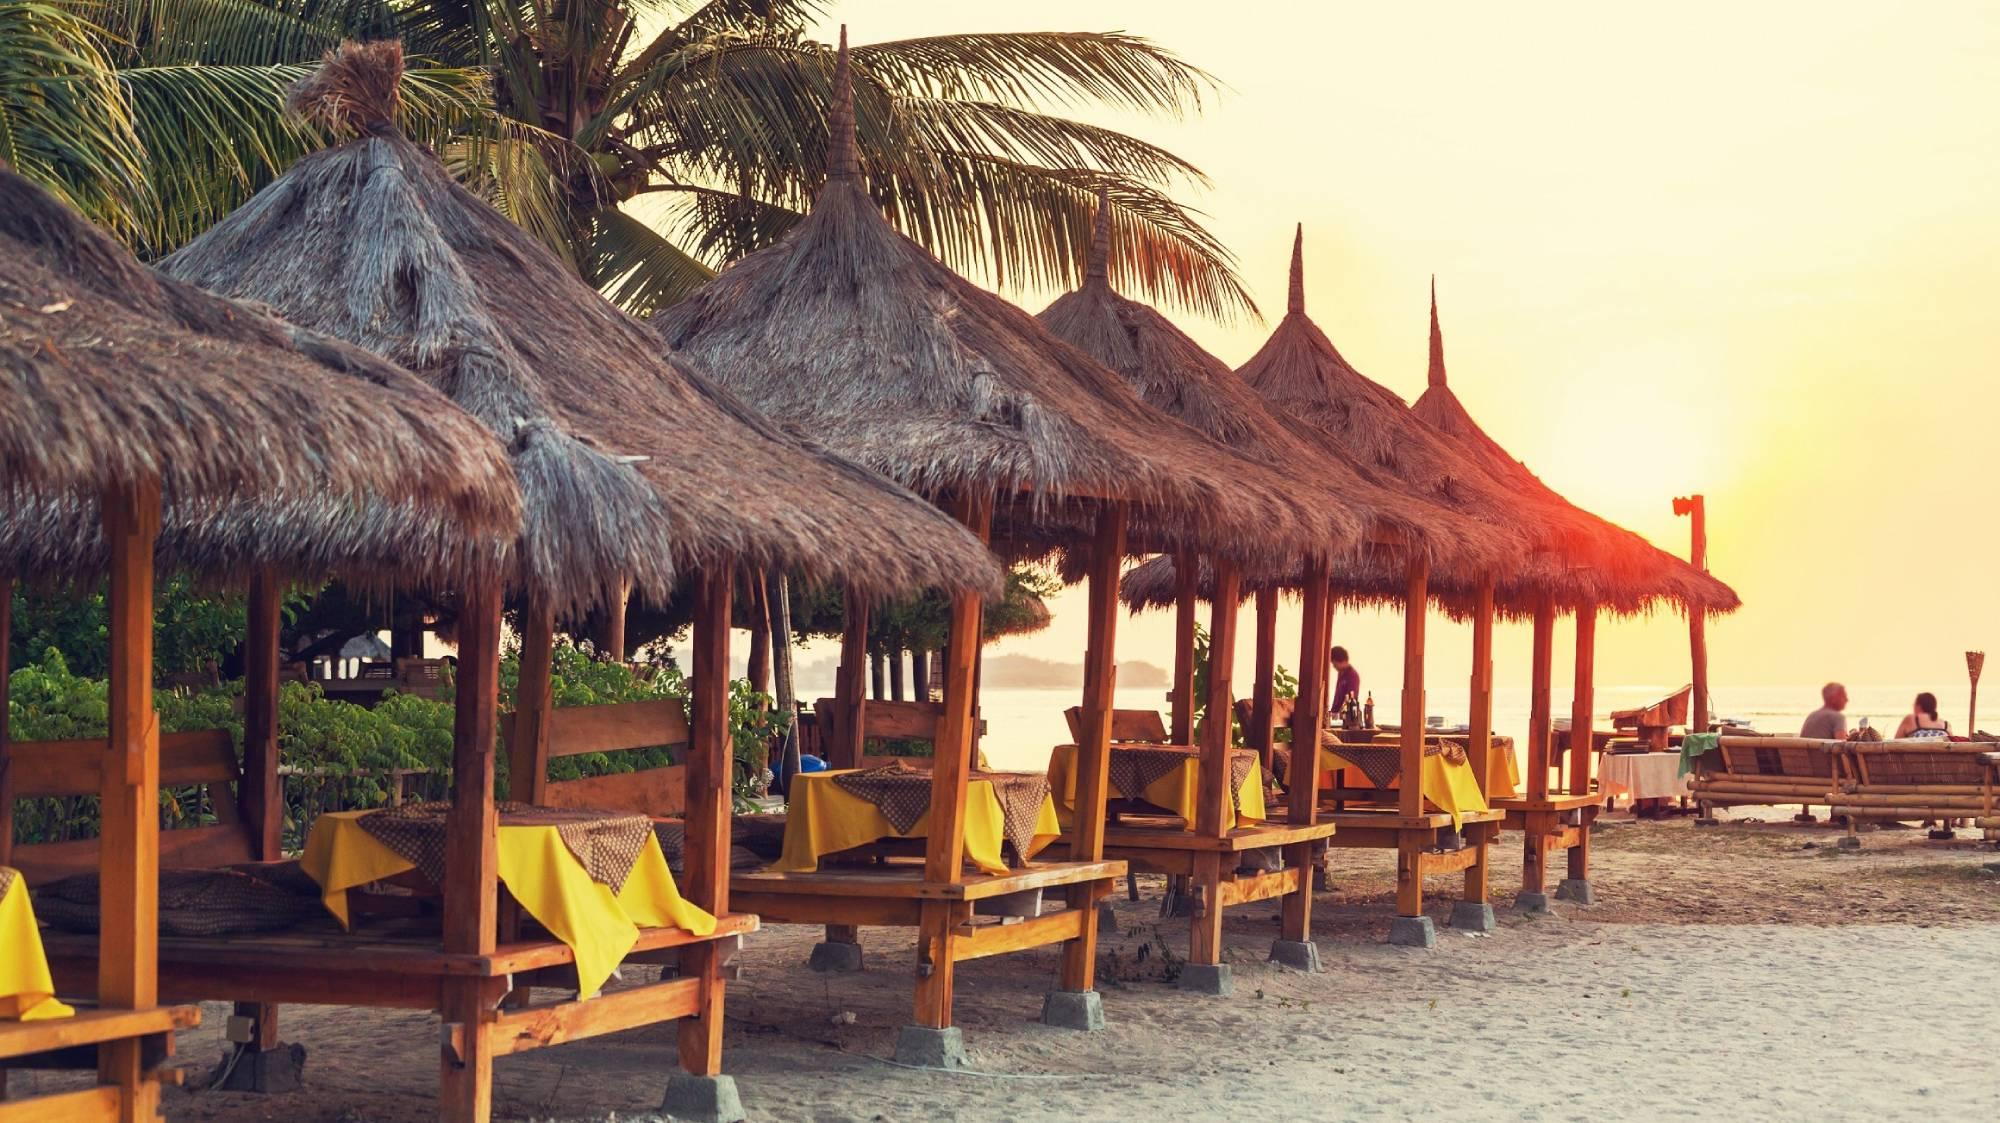 Bali - Travel Blog